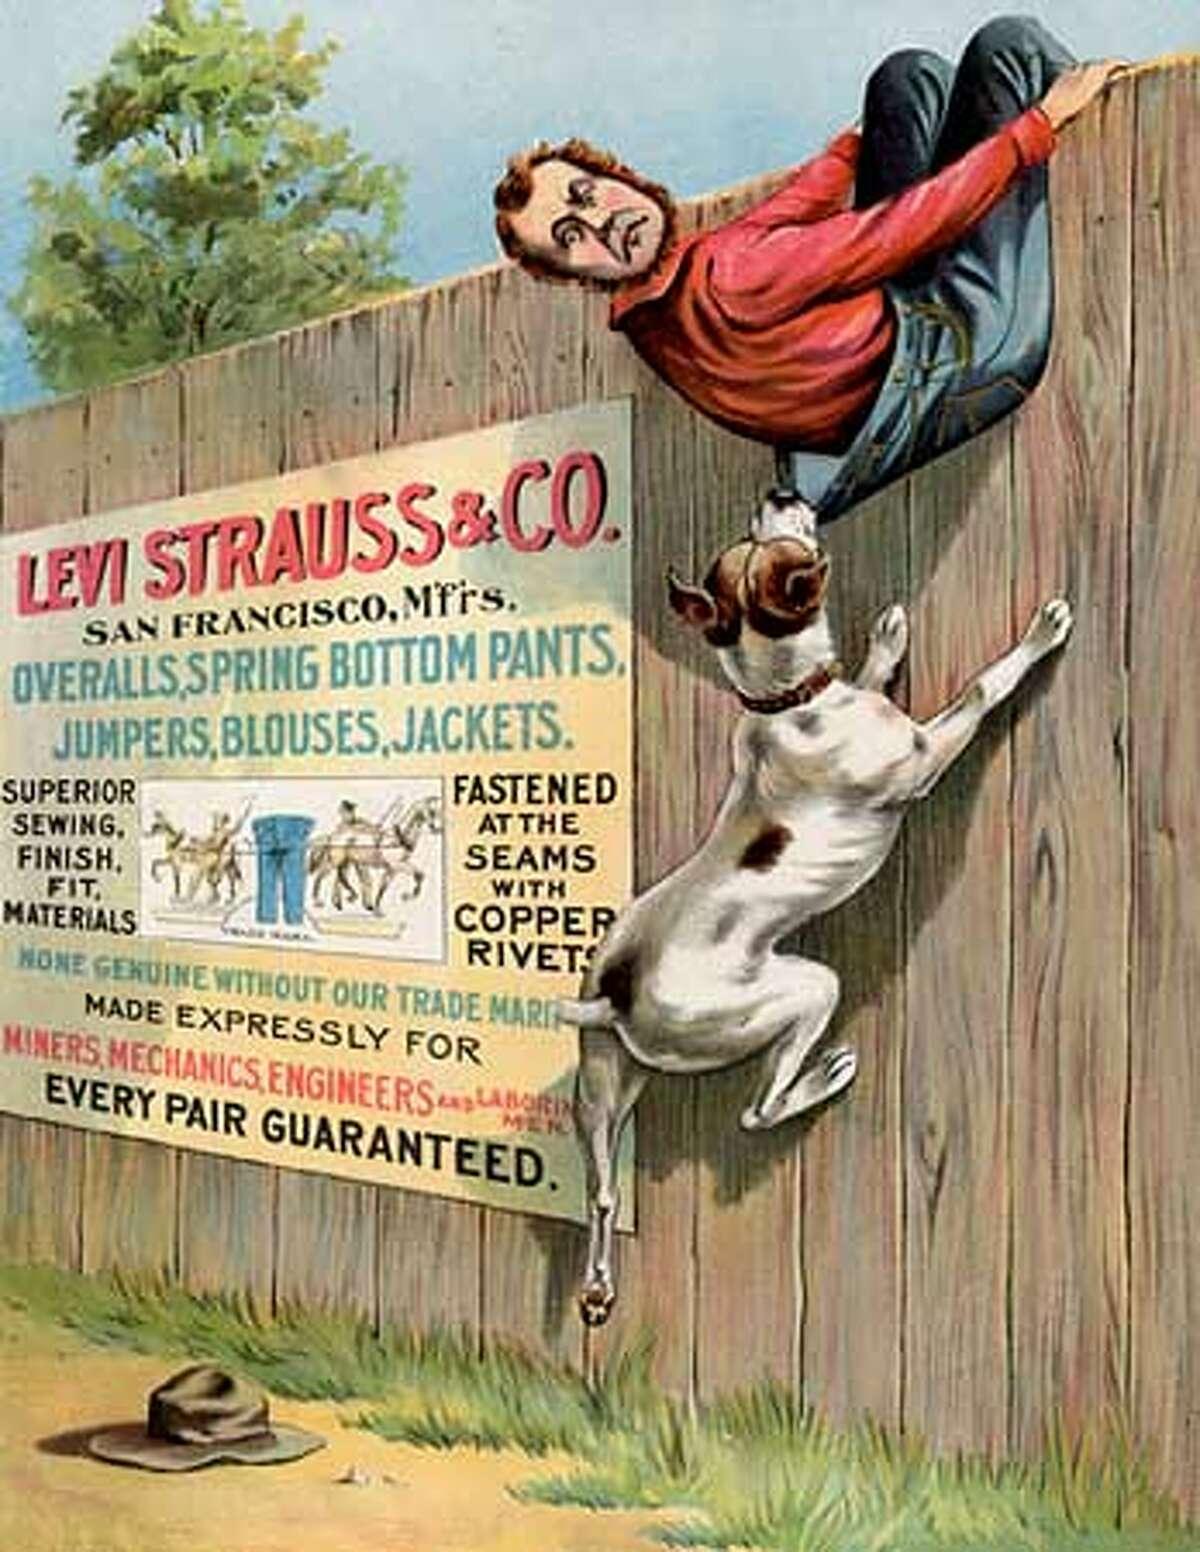 Levi's Advertising: 1899. Photo courtesy of Levi Strauss & Co.